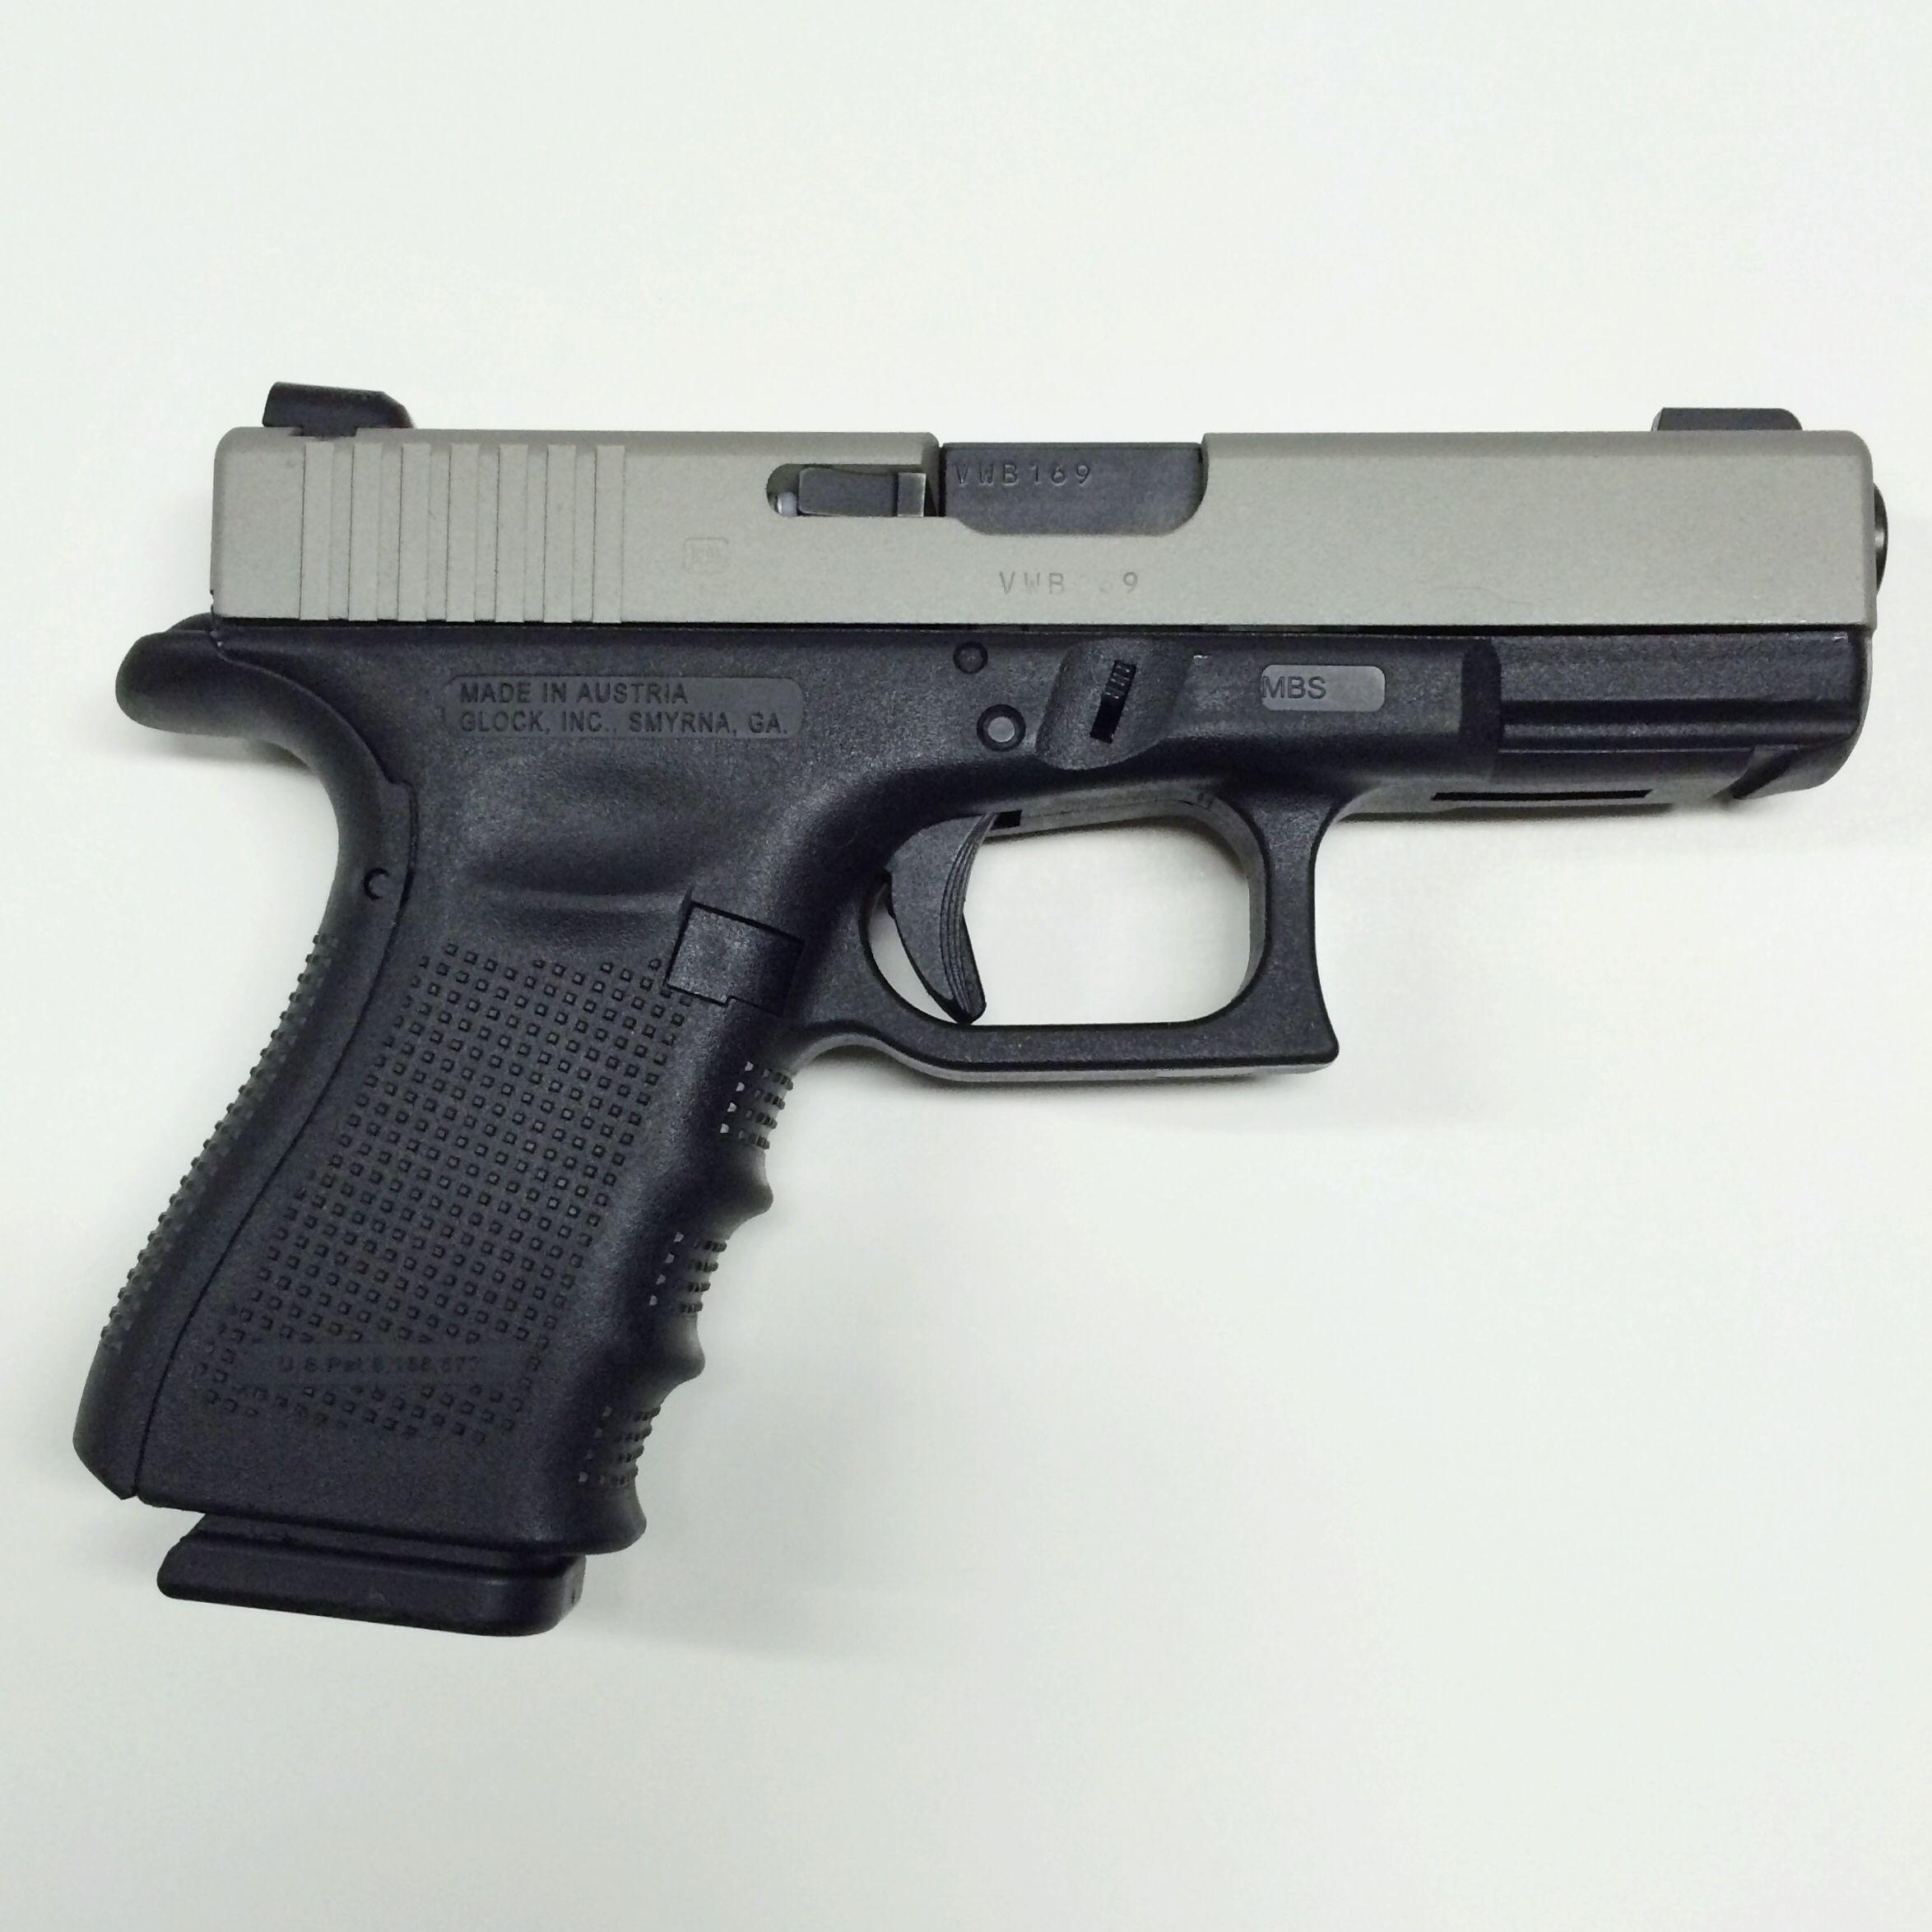 Glock 23, Gen 4 40 caliber, with an NiB-X slide finish that provides ...